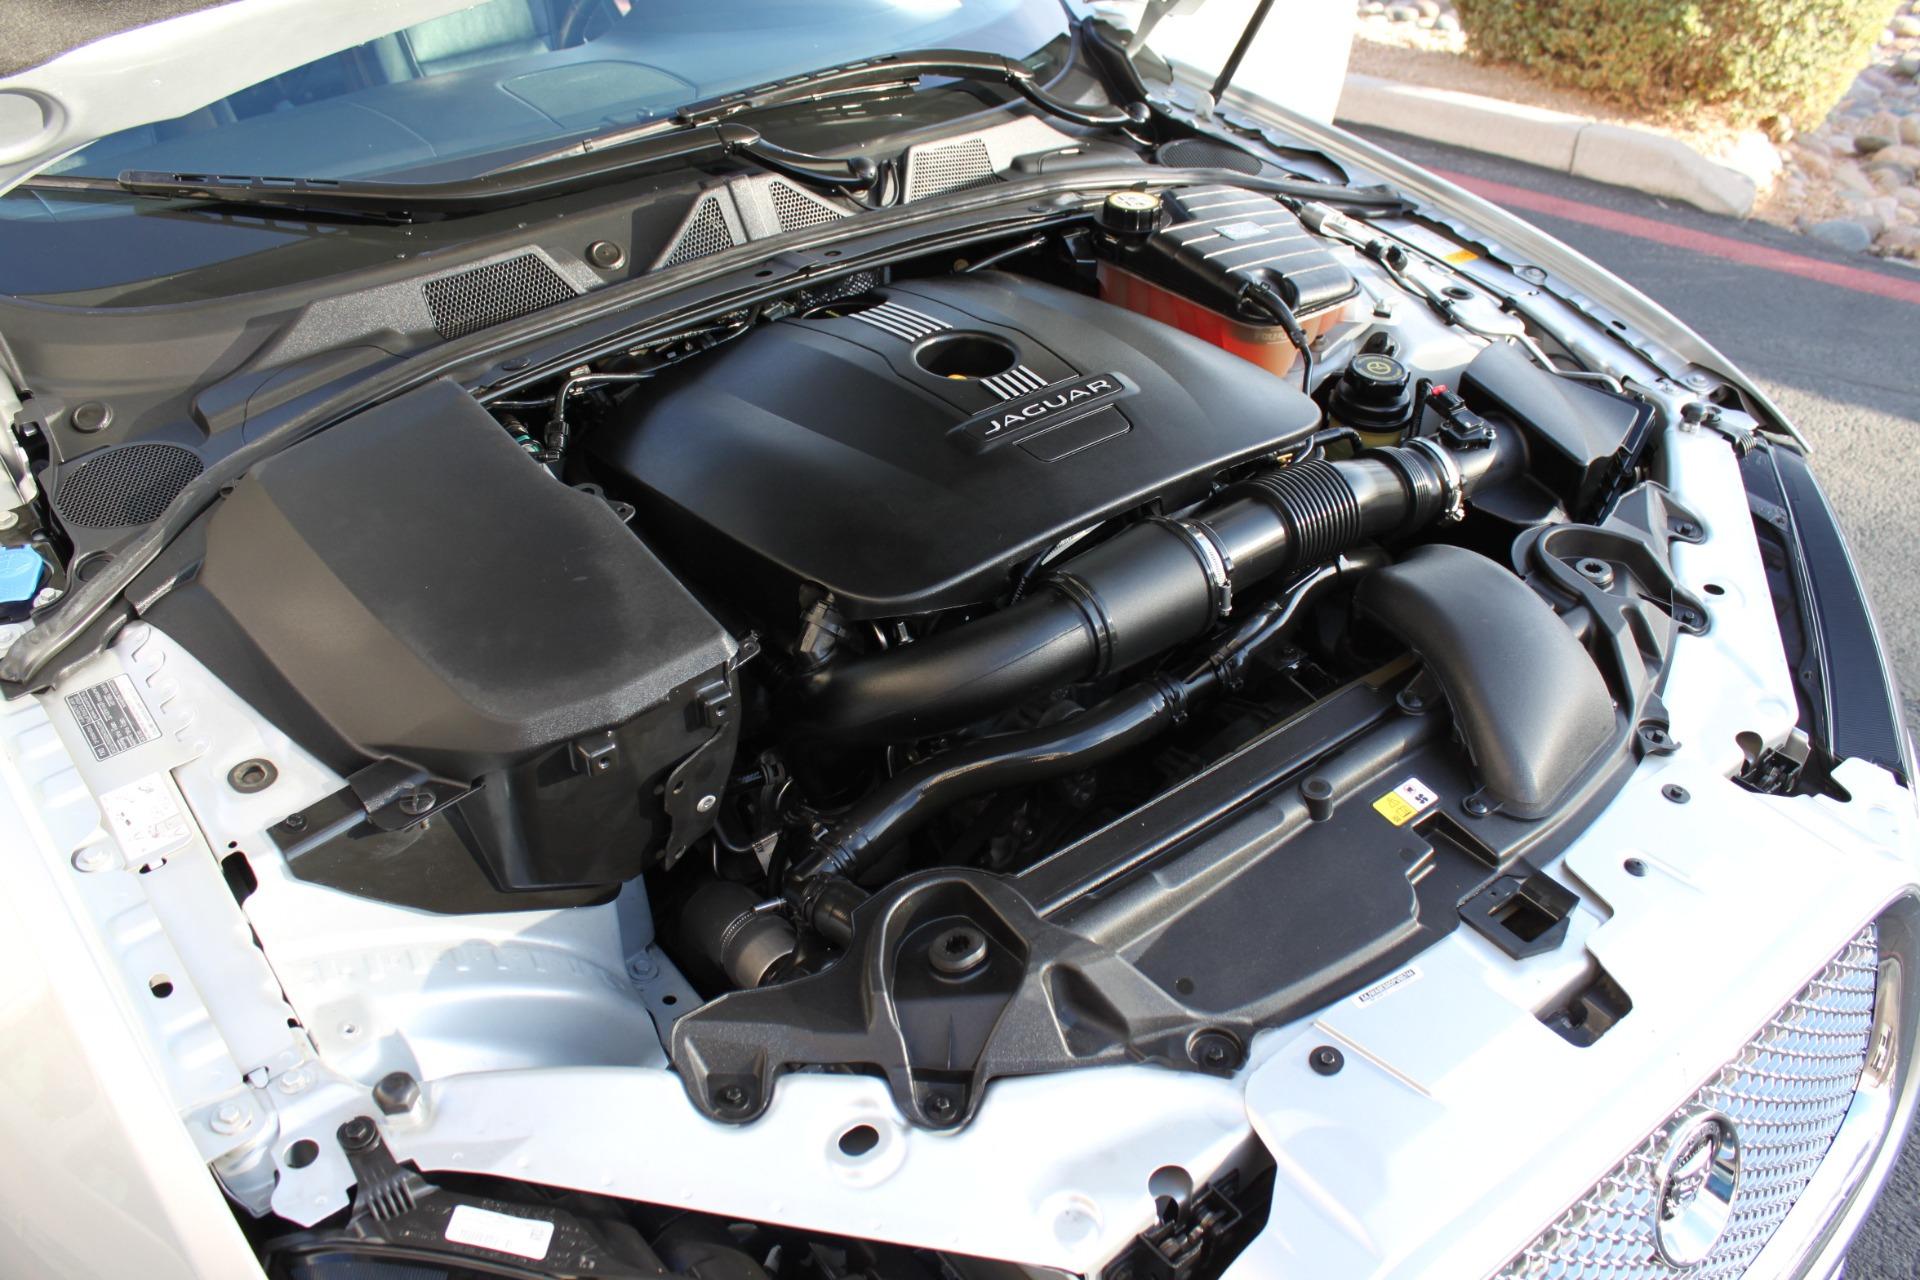 Used-2013-Jaguar-XF-I4-RWD-Audi